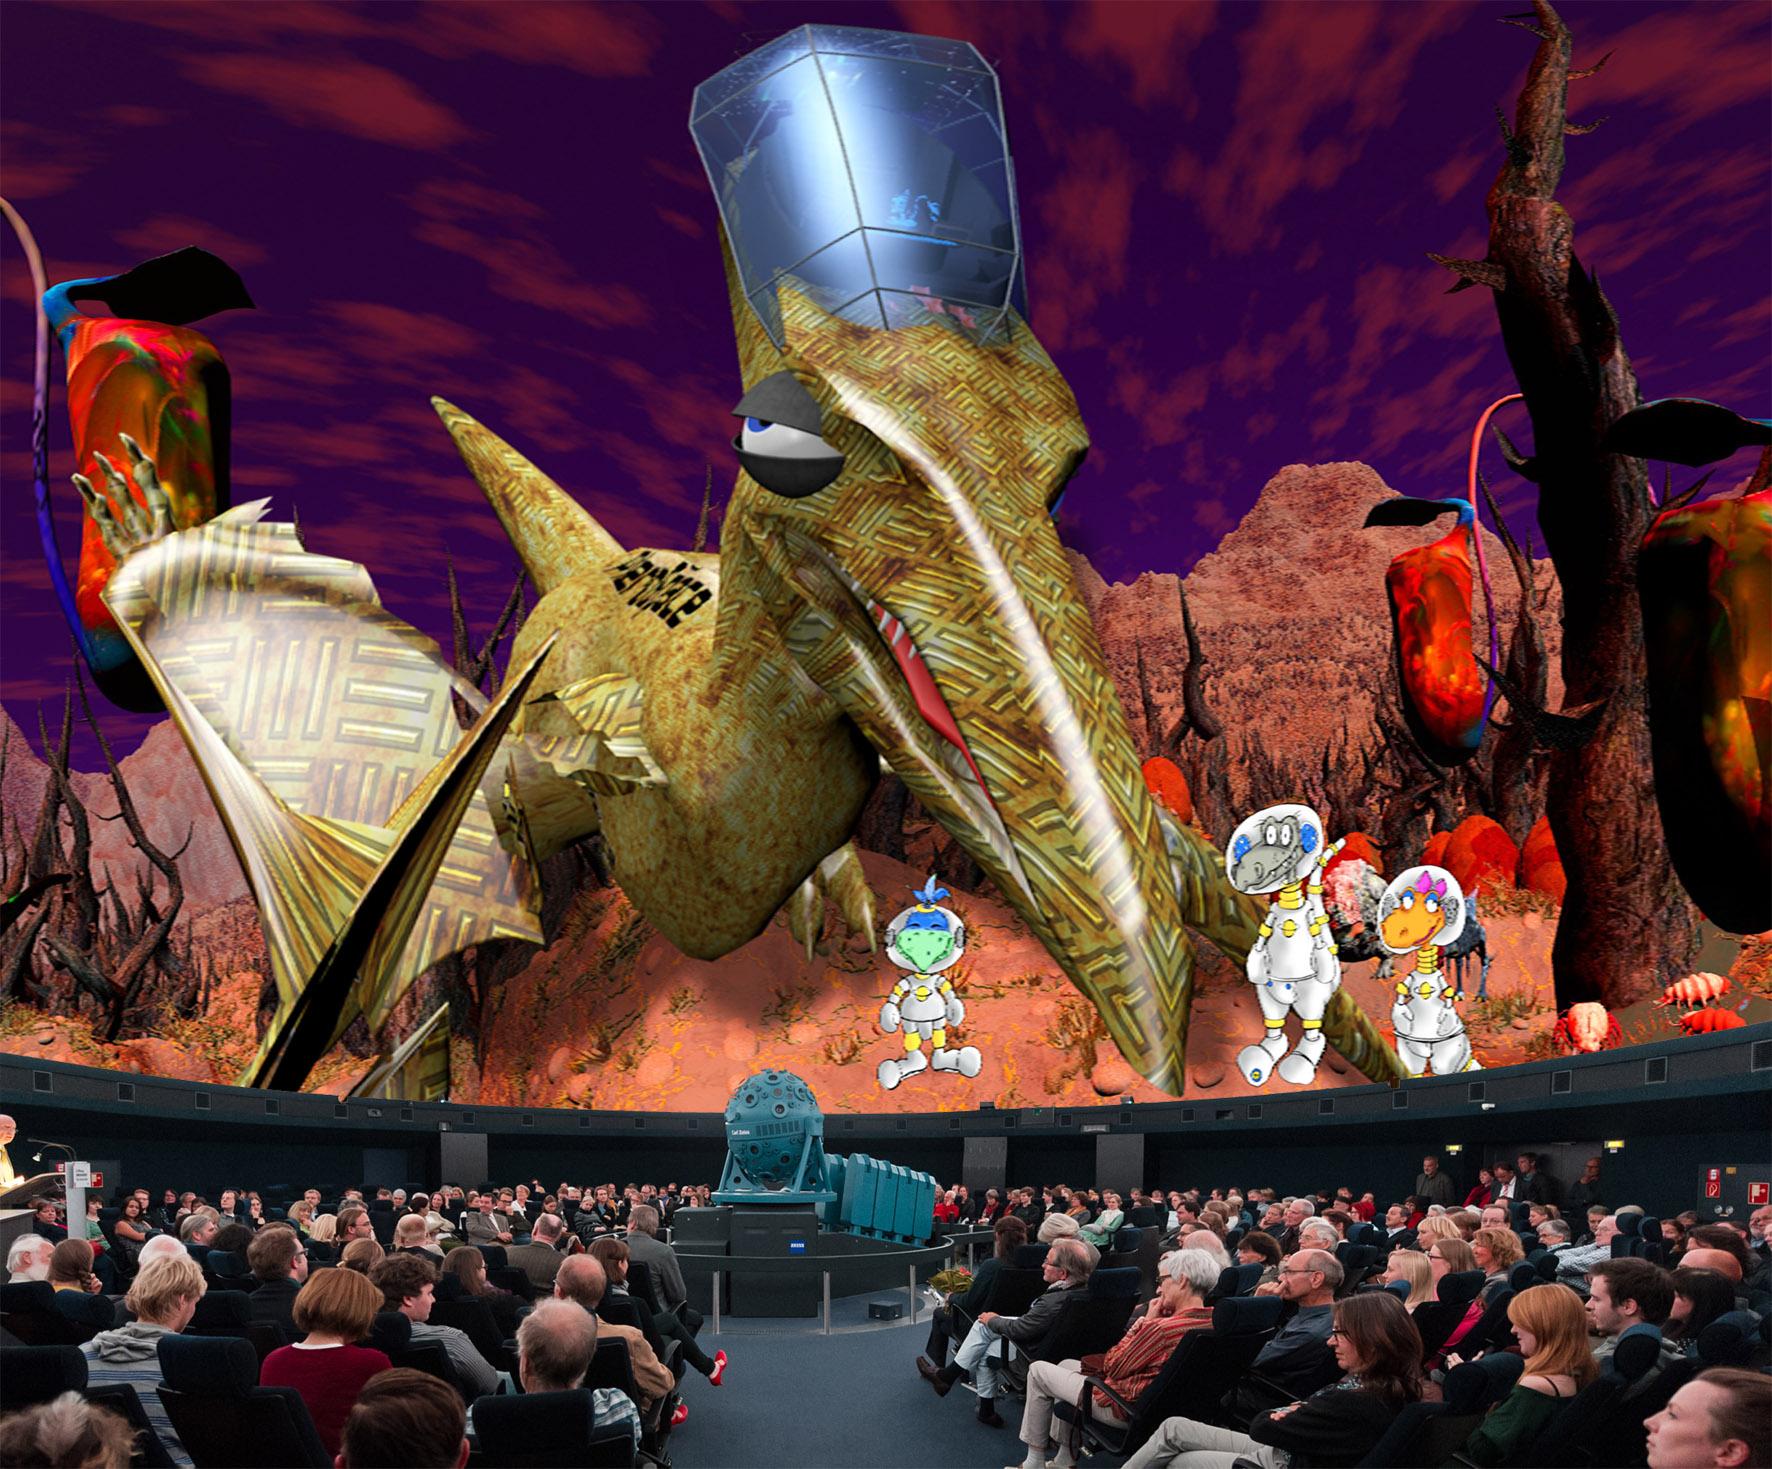 Bilddatei: Dinos02_Innenraum_Muenster-kl(C)LWL+PlanetariumBochum.jpg